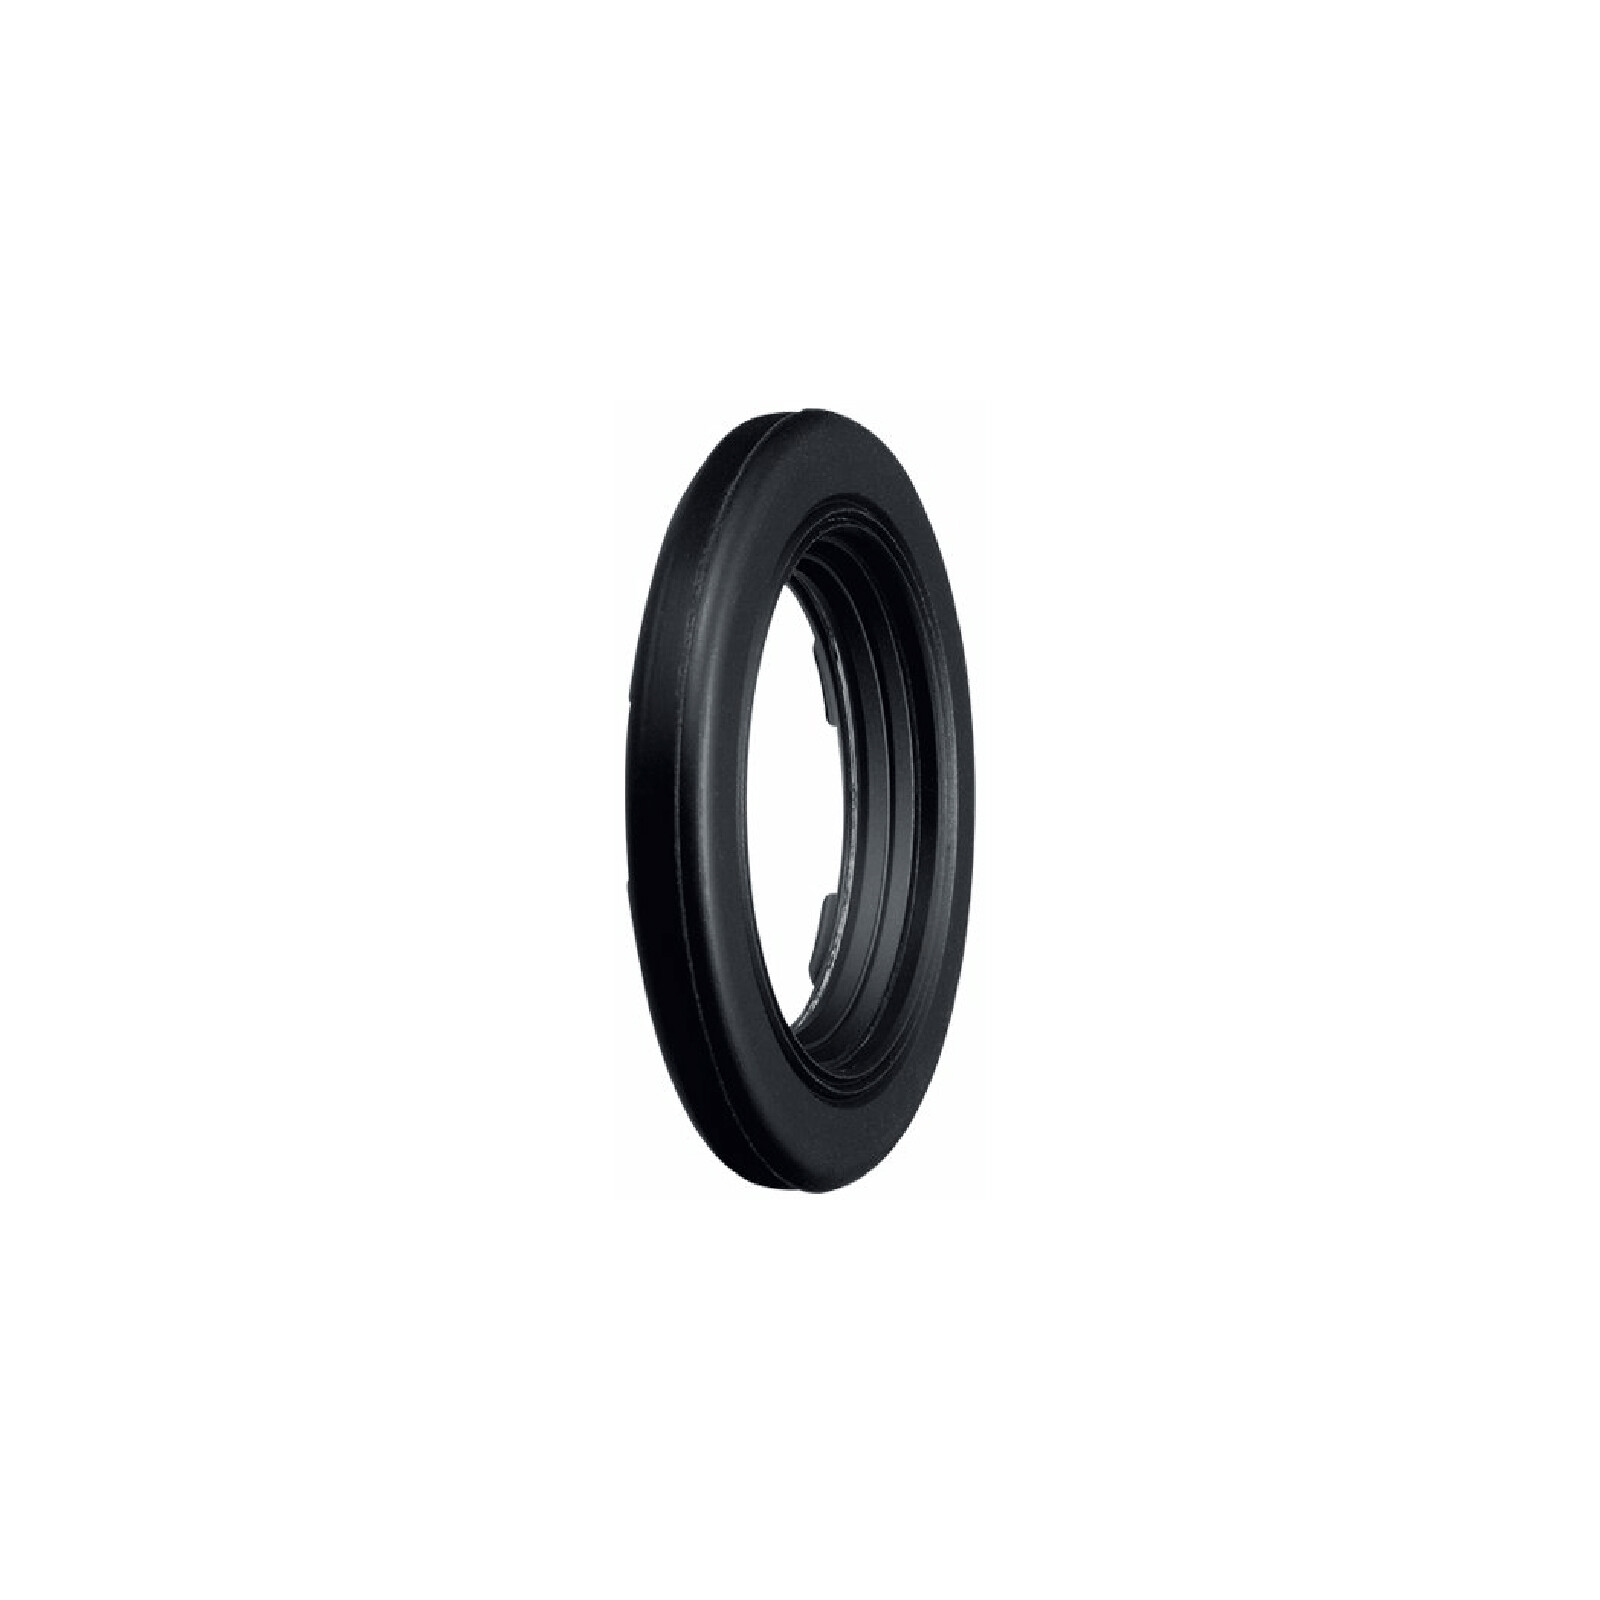 Nikon DK-17C 0 Korrekturlinse